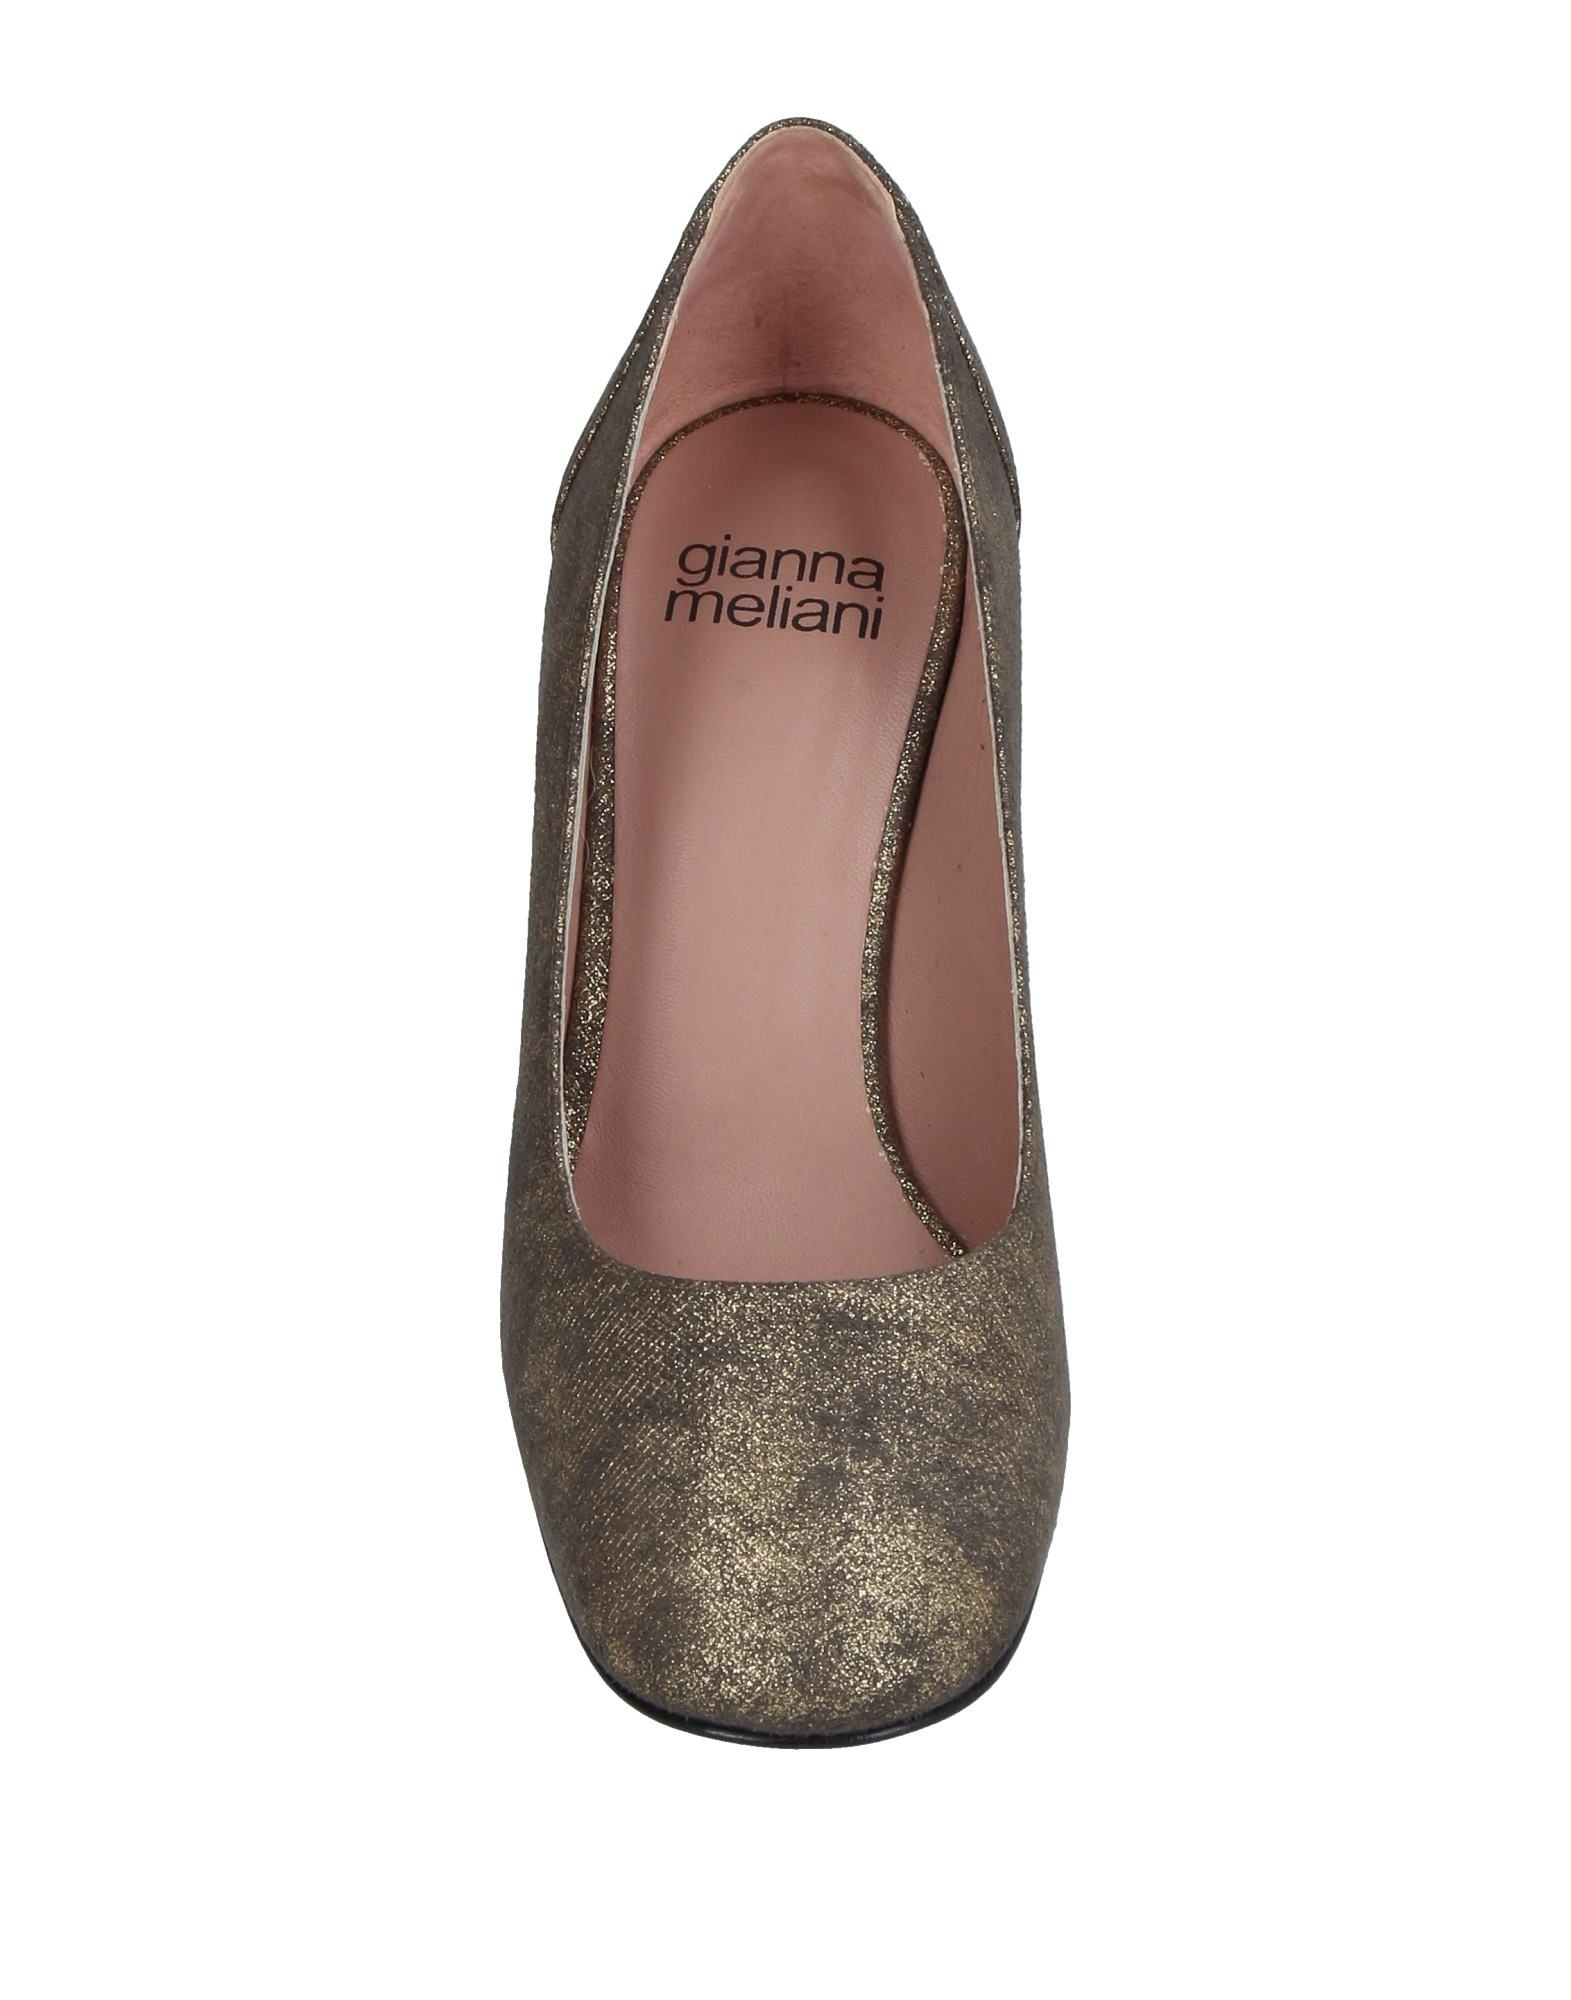 Stilvolle Stilvolle Stilvolle billige Schuhe Gianna Meliani Pumps Damen  11216053BO 6443c6